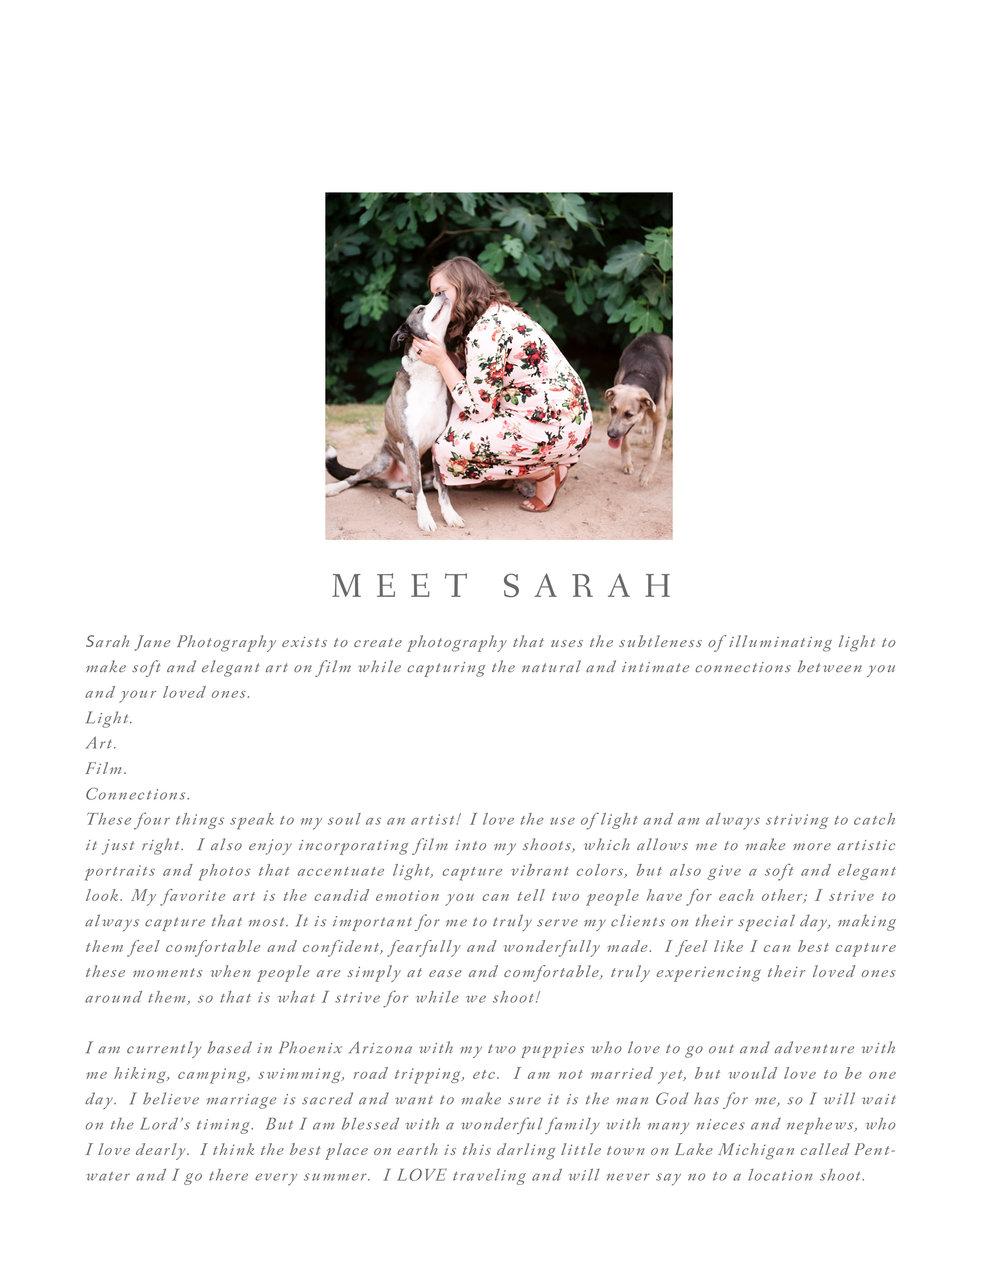 2Sarah Jane Photography Wedding Pricing 2017-2018.jpg